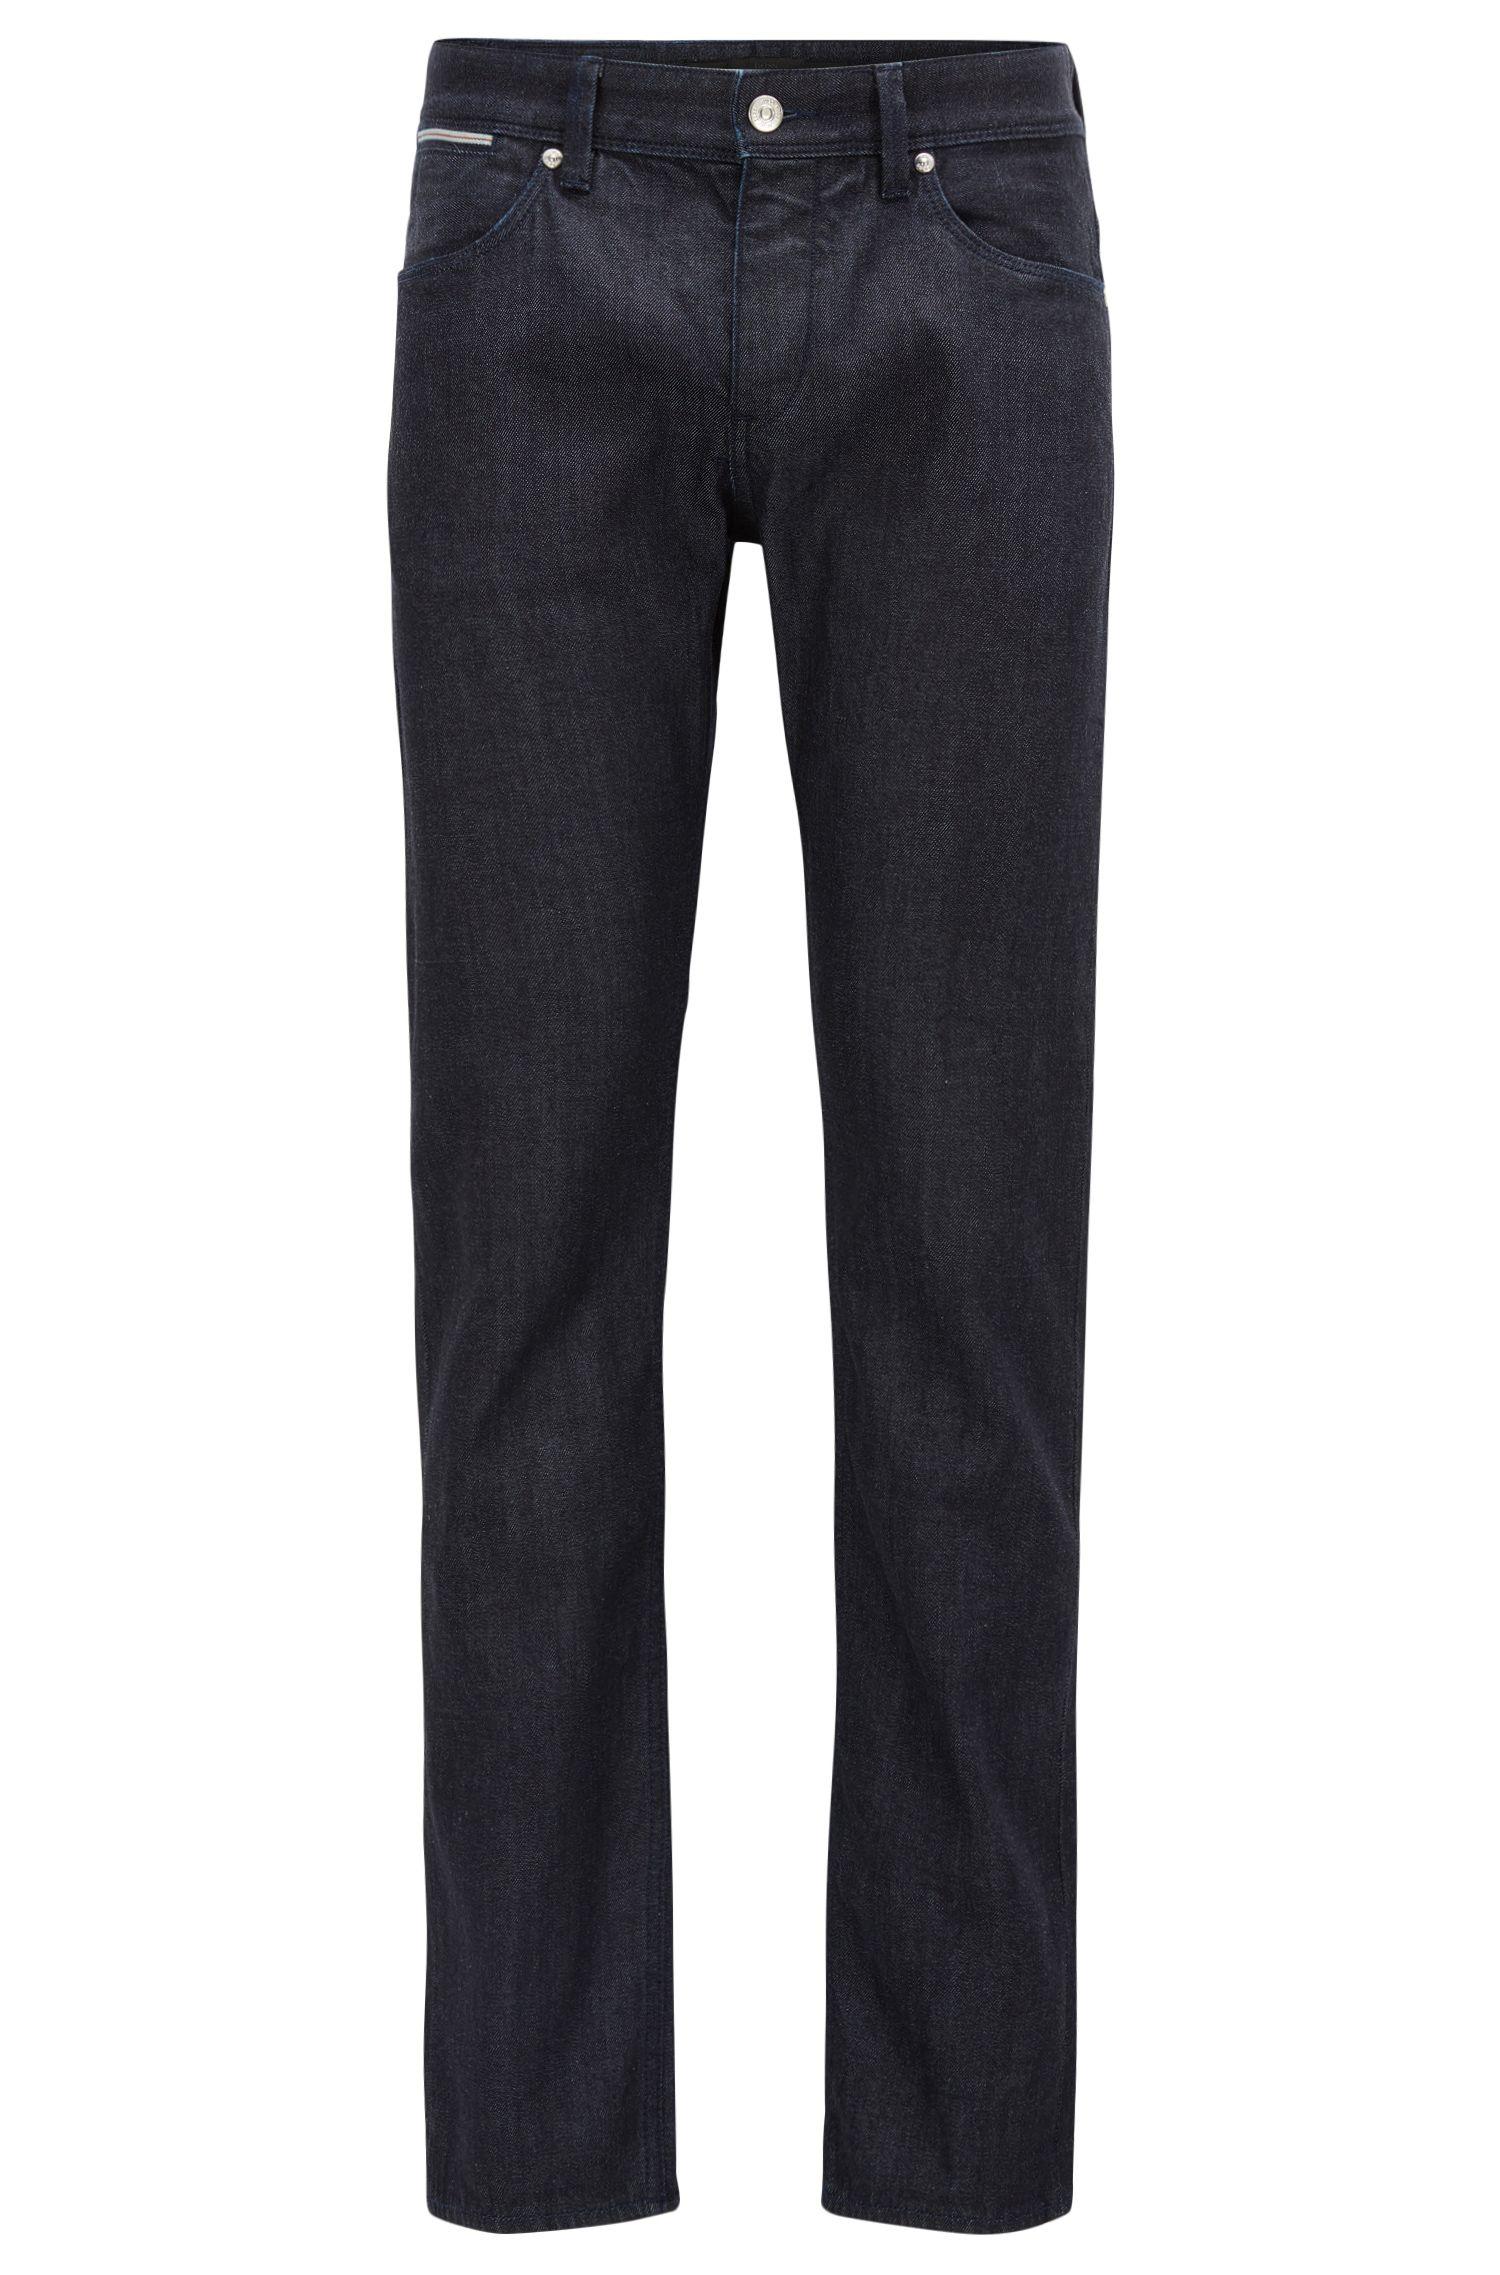 'Delaware' l Slim Fit, Stretch Cotton Jeans